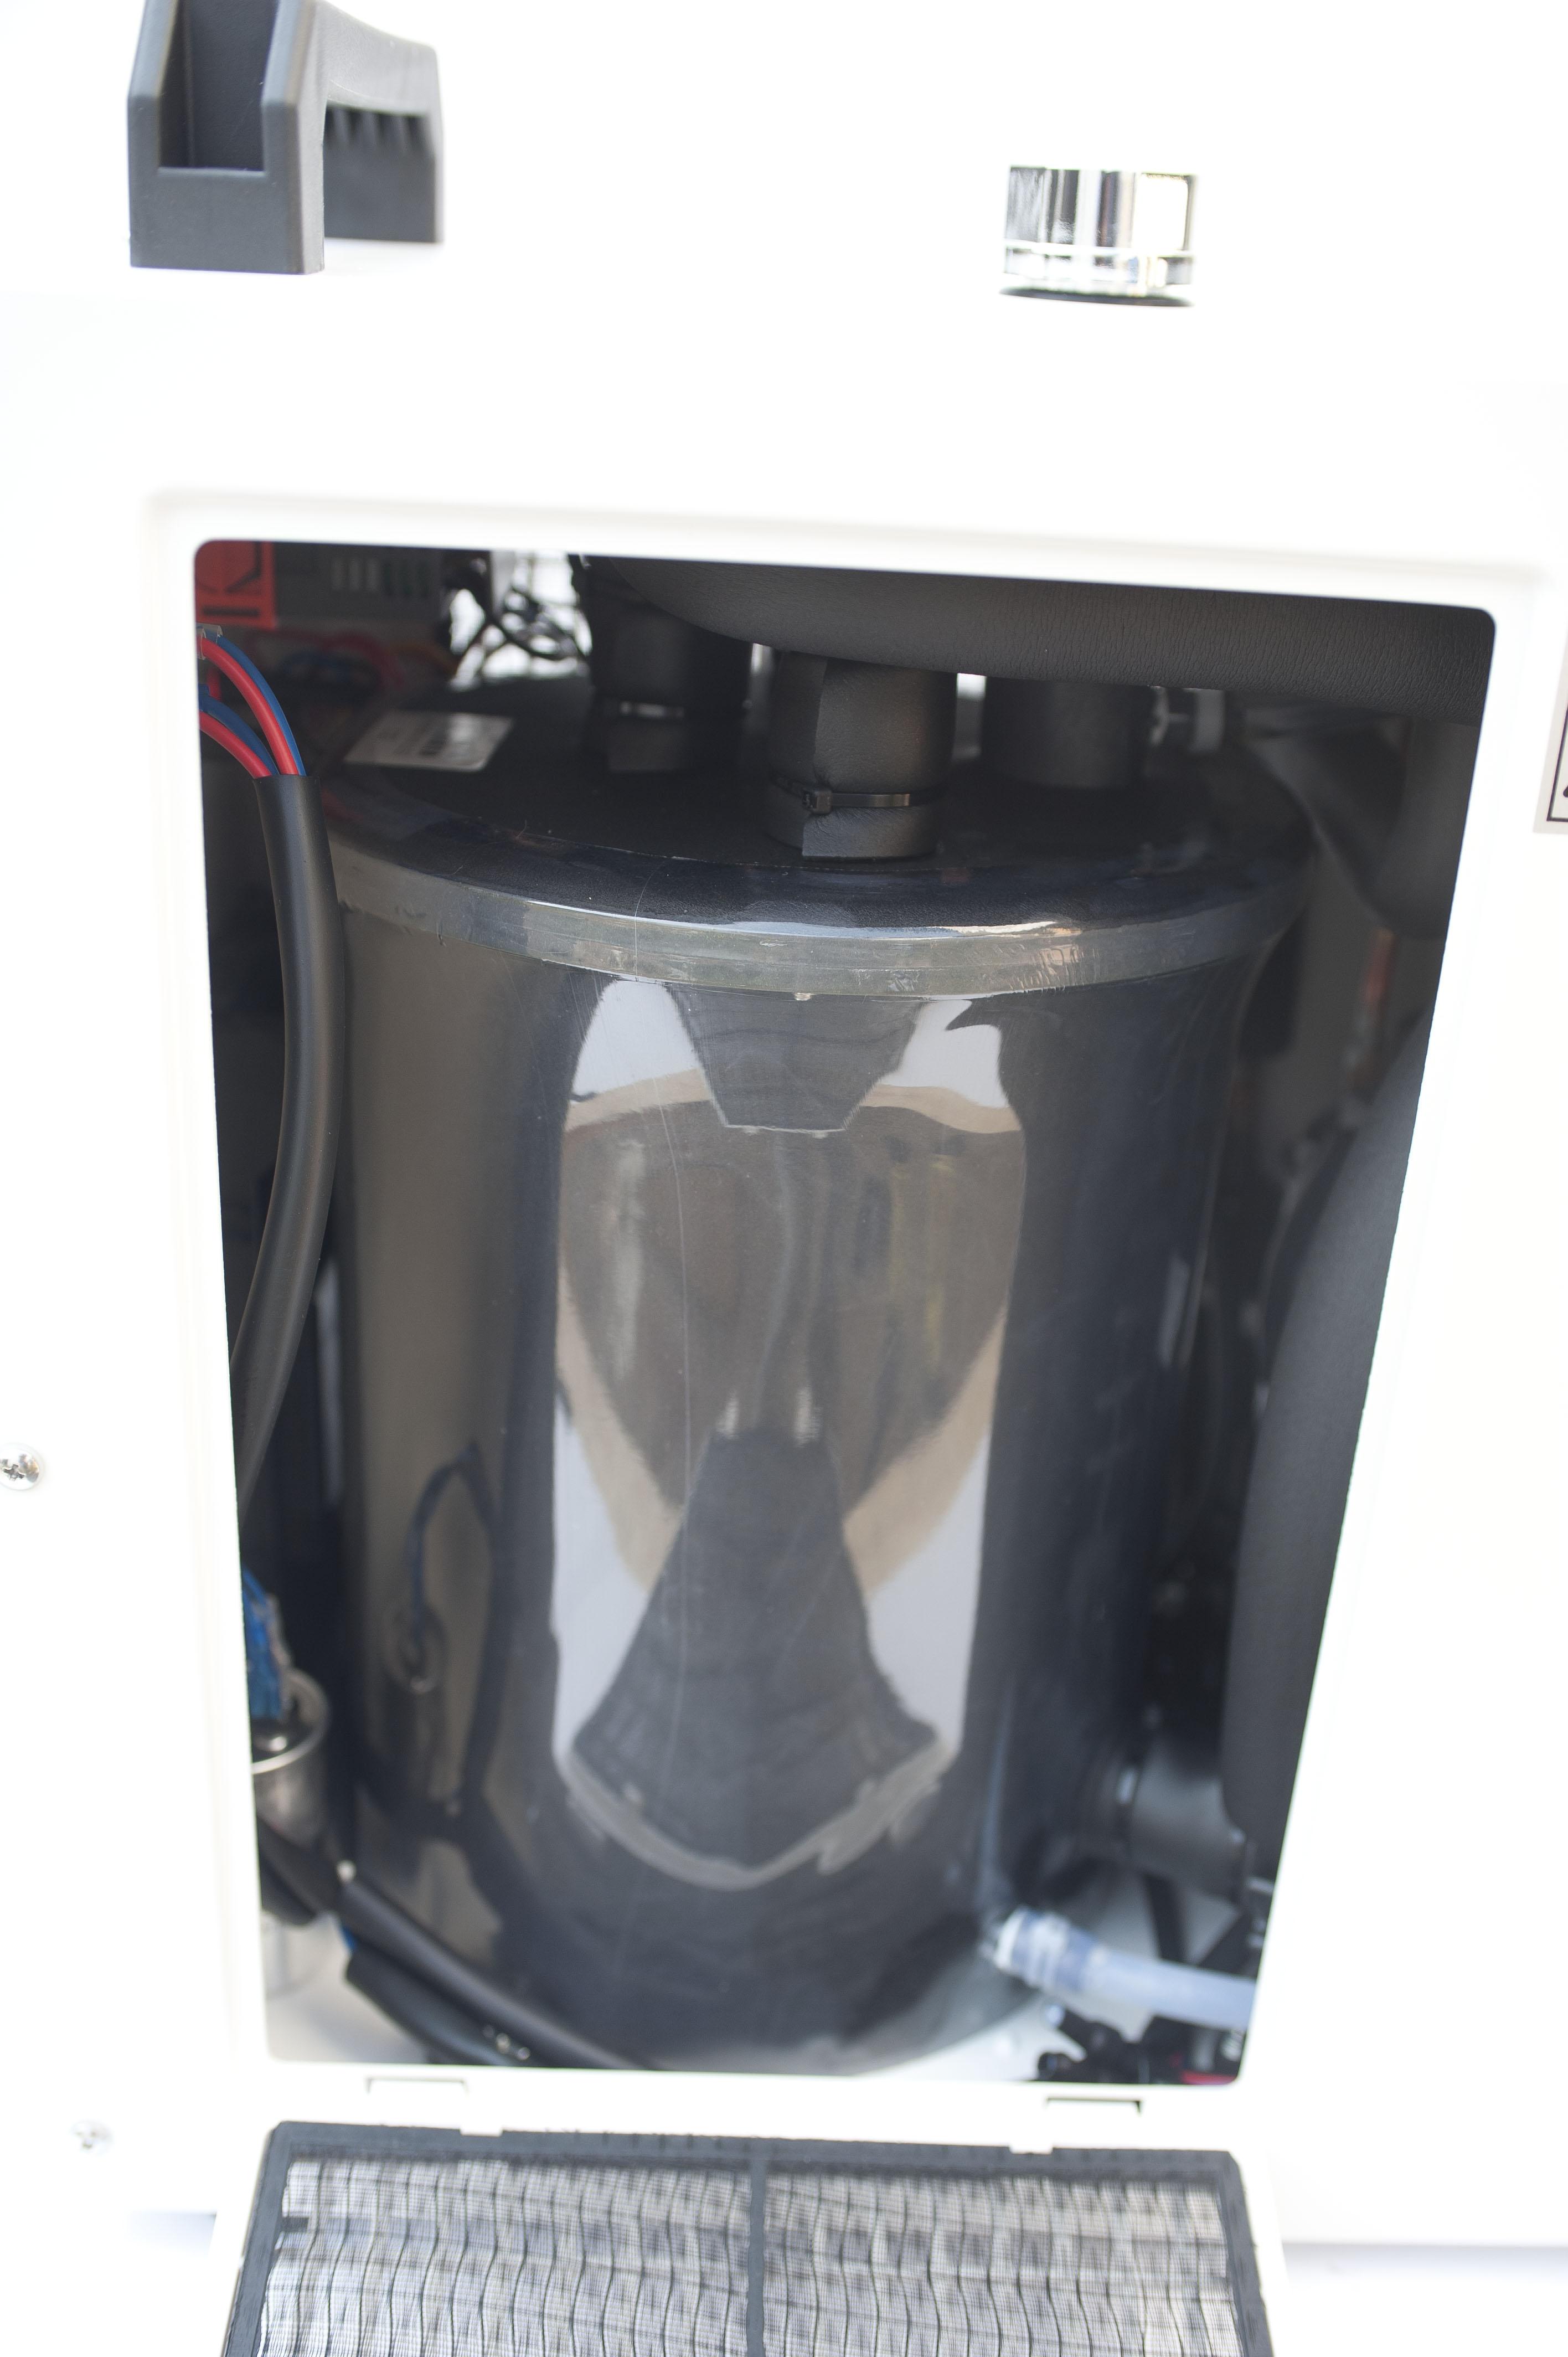 Чиллер cW 5000 для лазерного CO2 станка